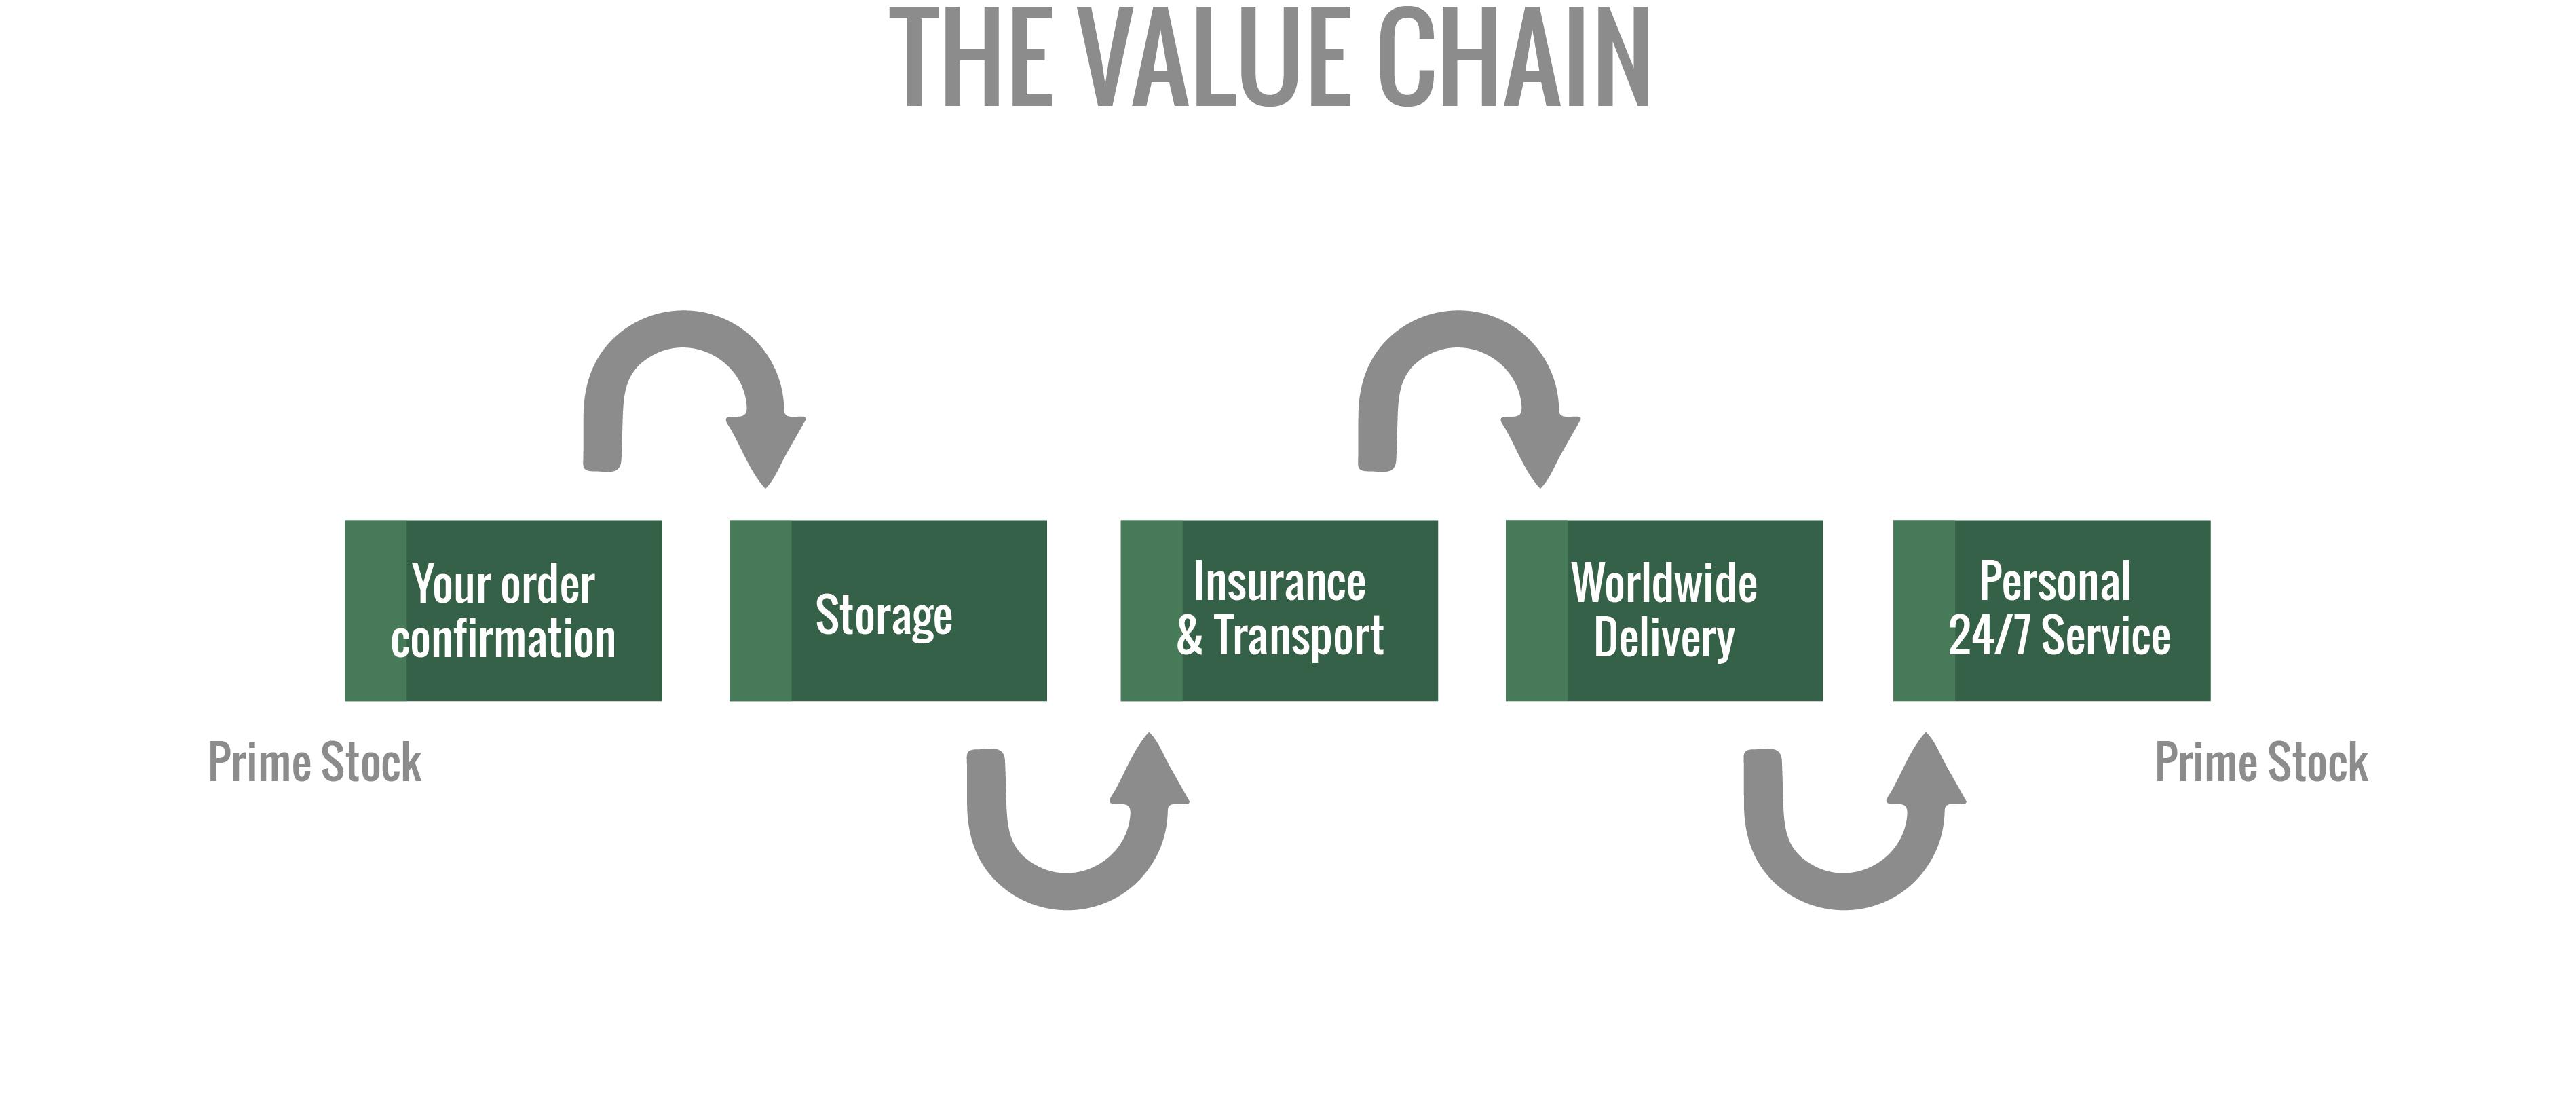 The Prime Stock value chain